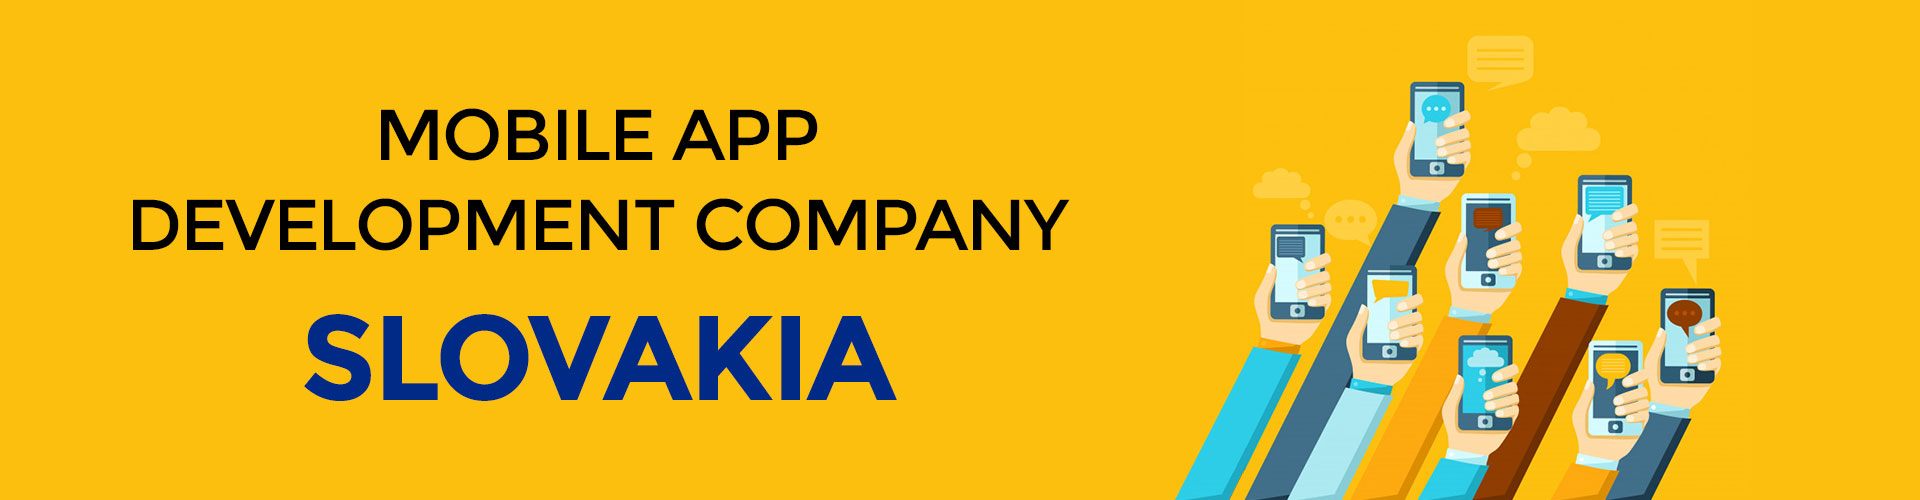 mobile app development company slovakia